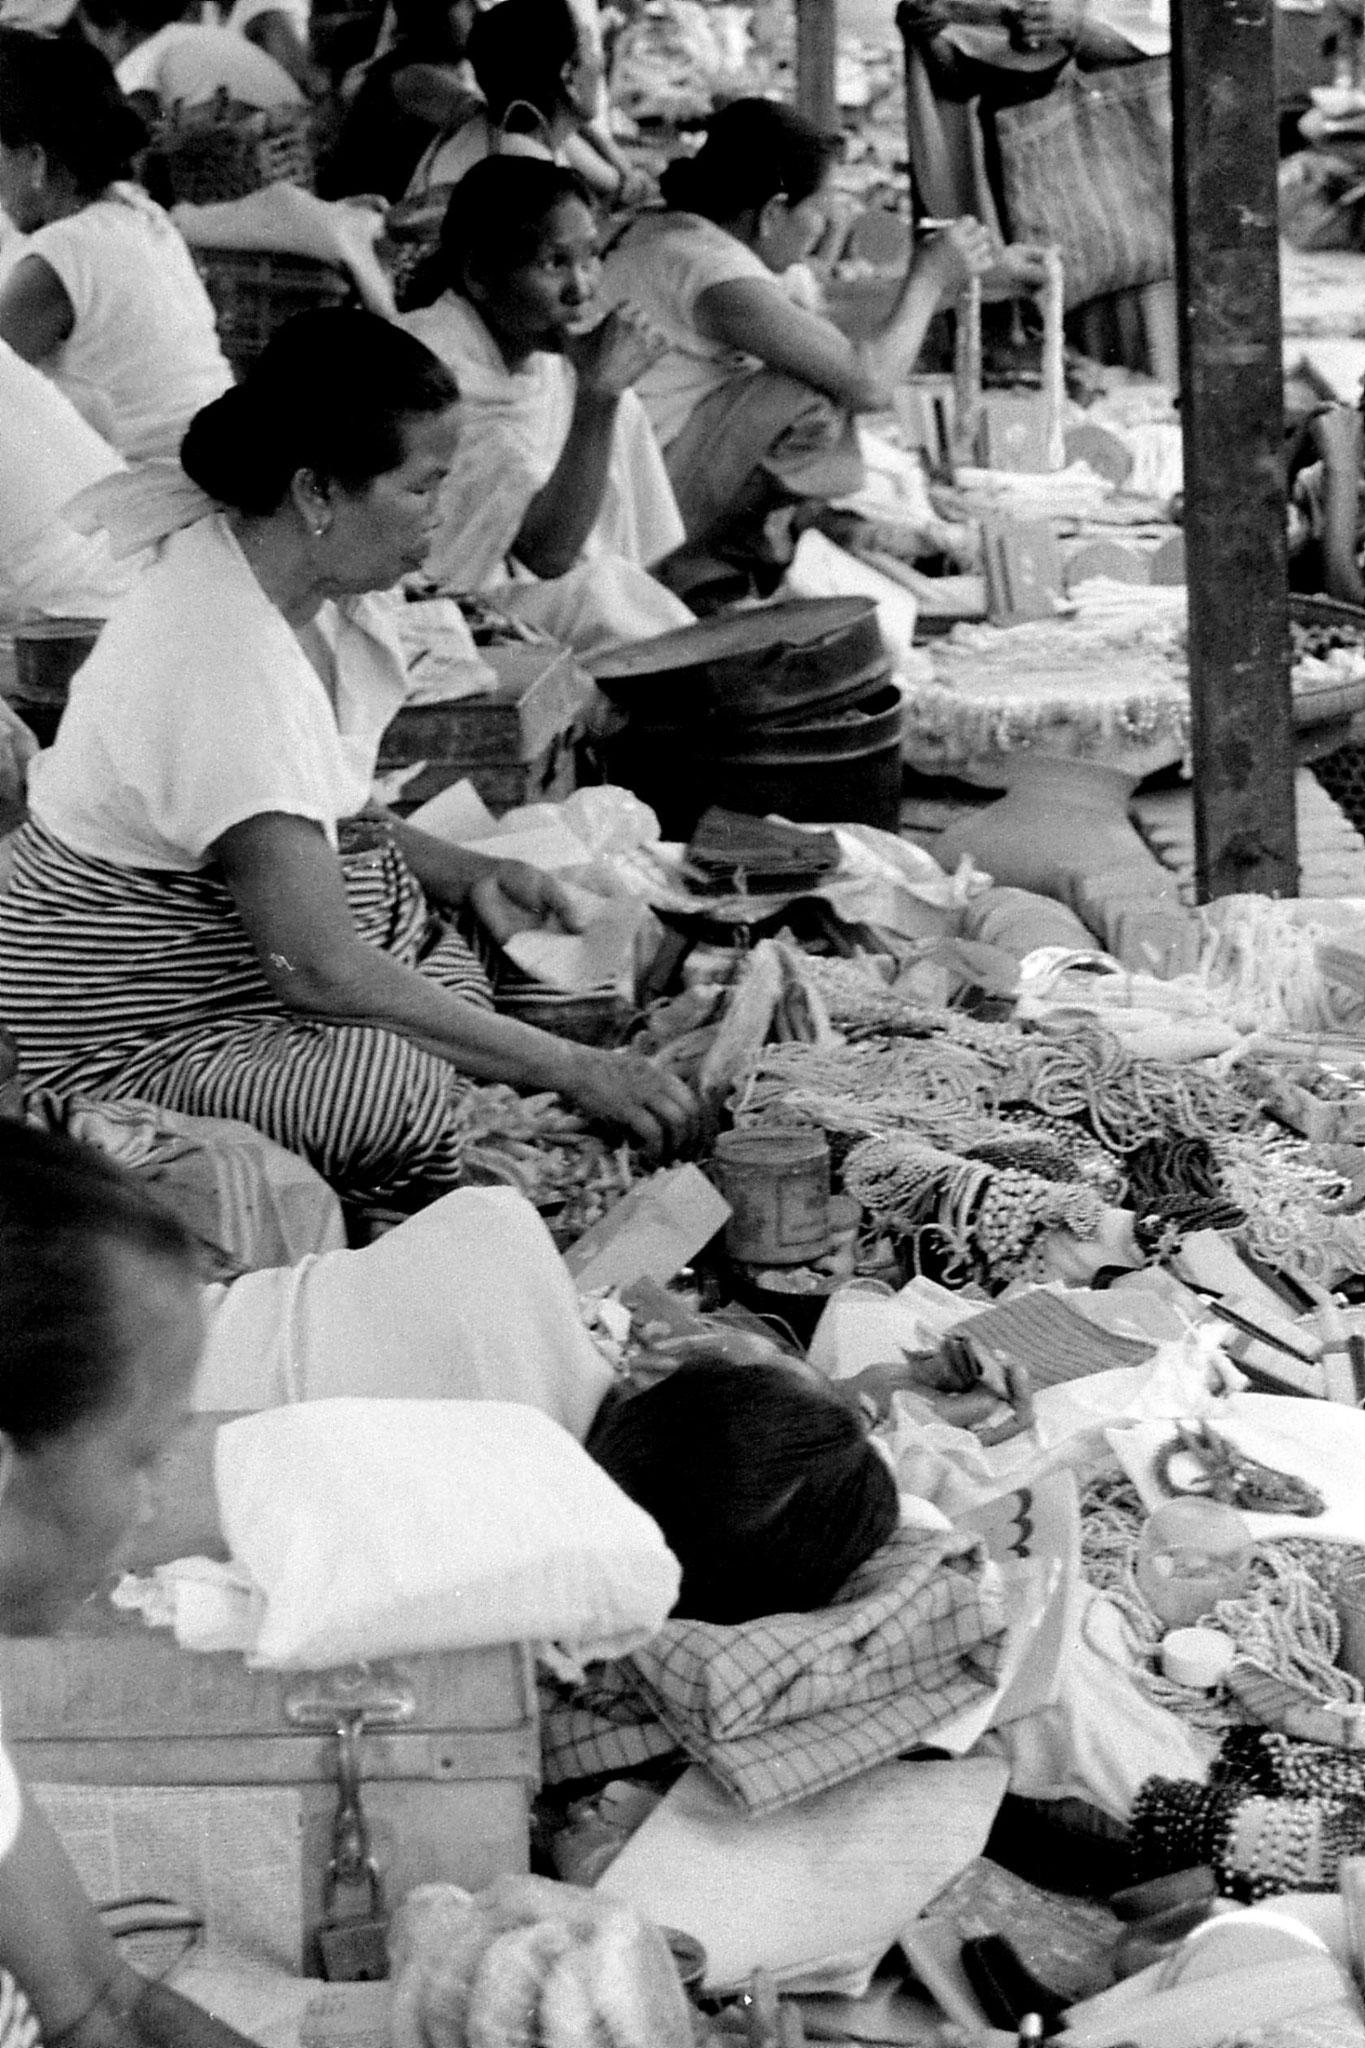 17/4/1990: 10: Imphal women's market